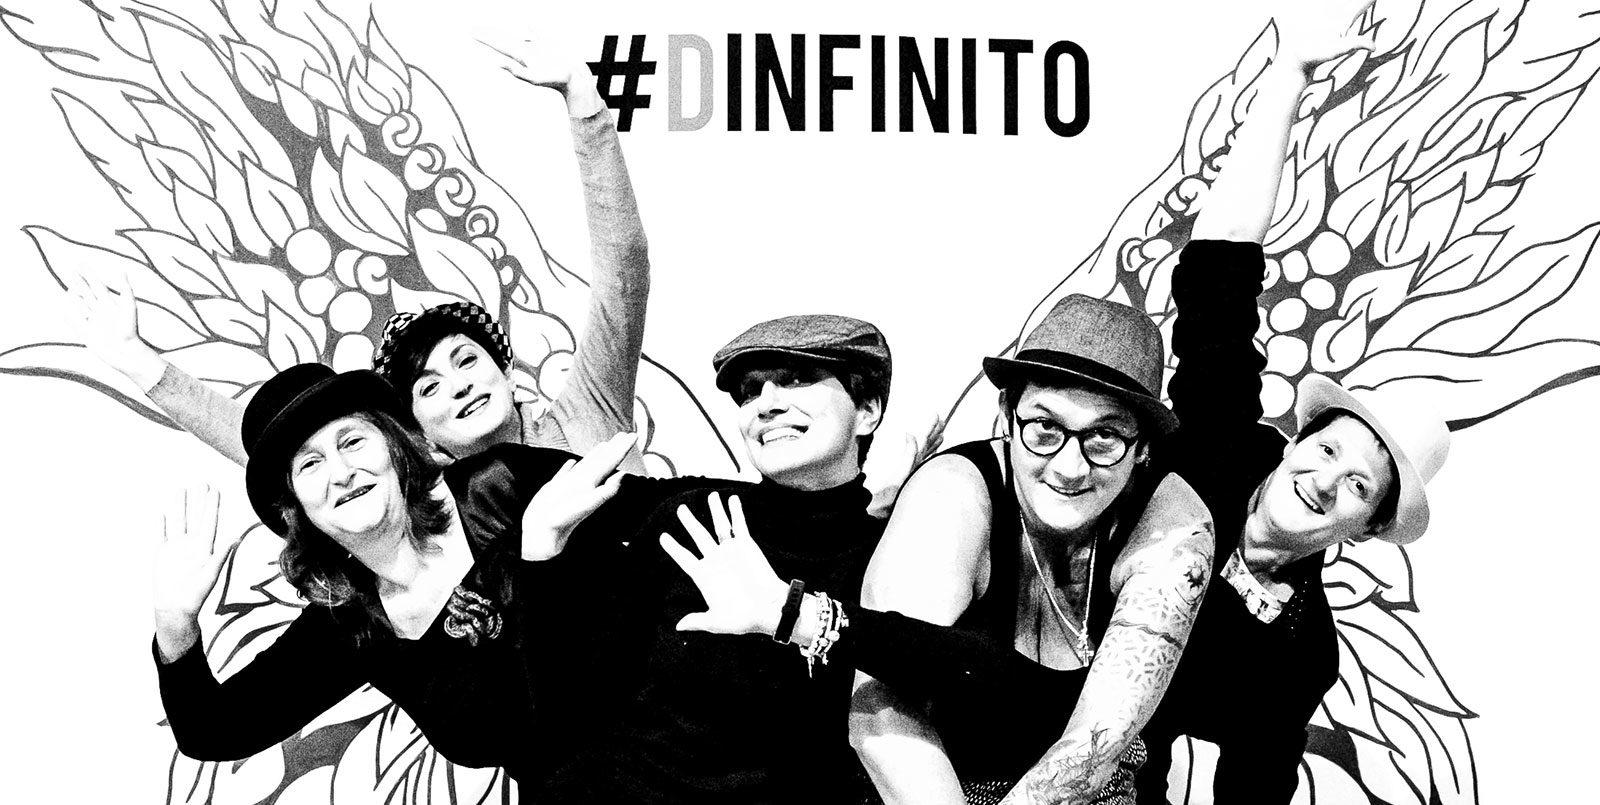 #DINFINITO